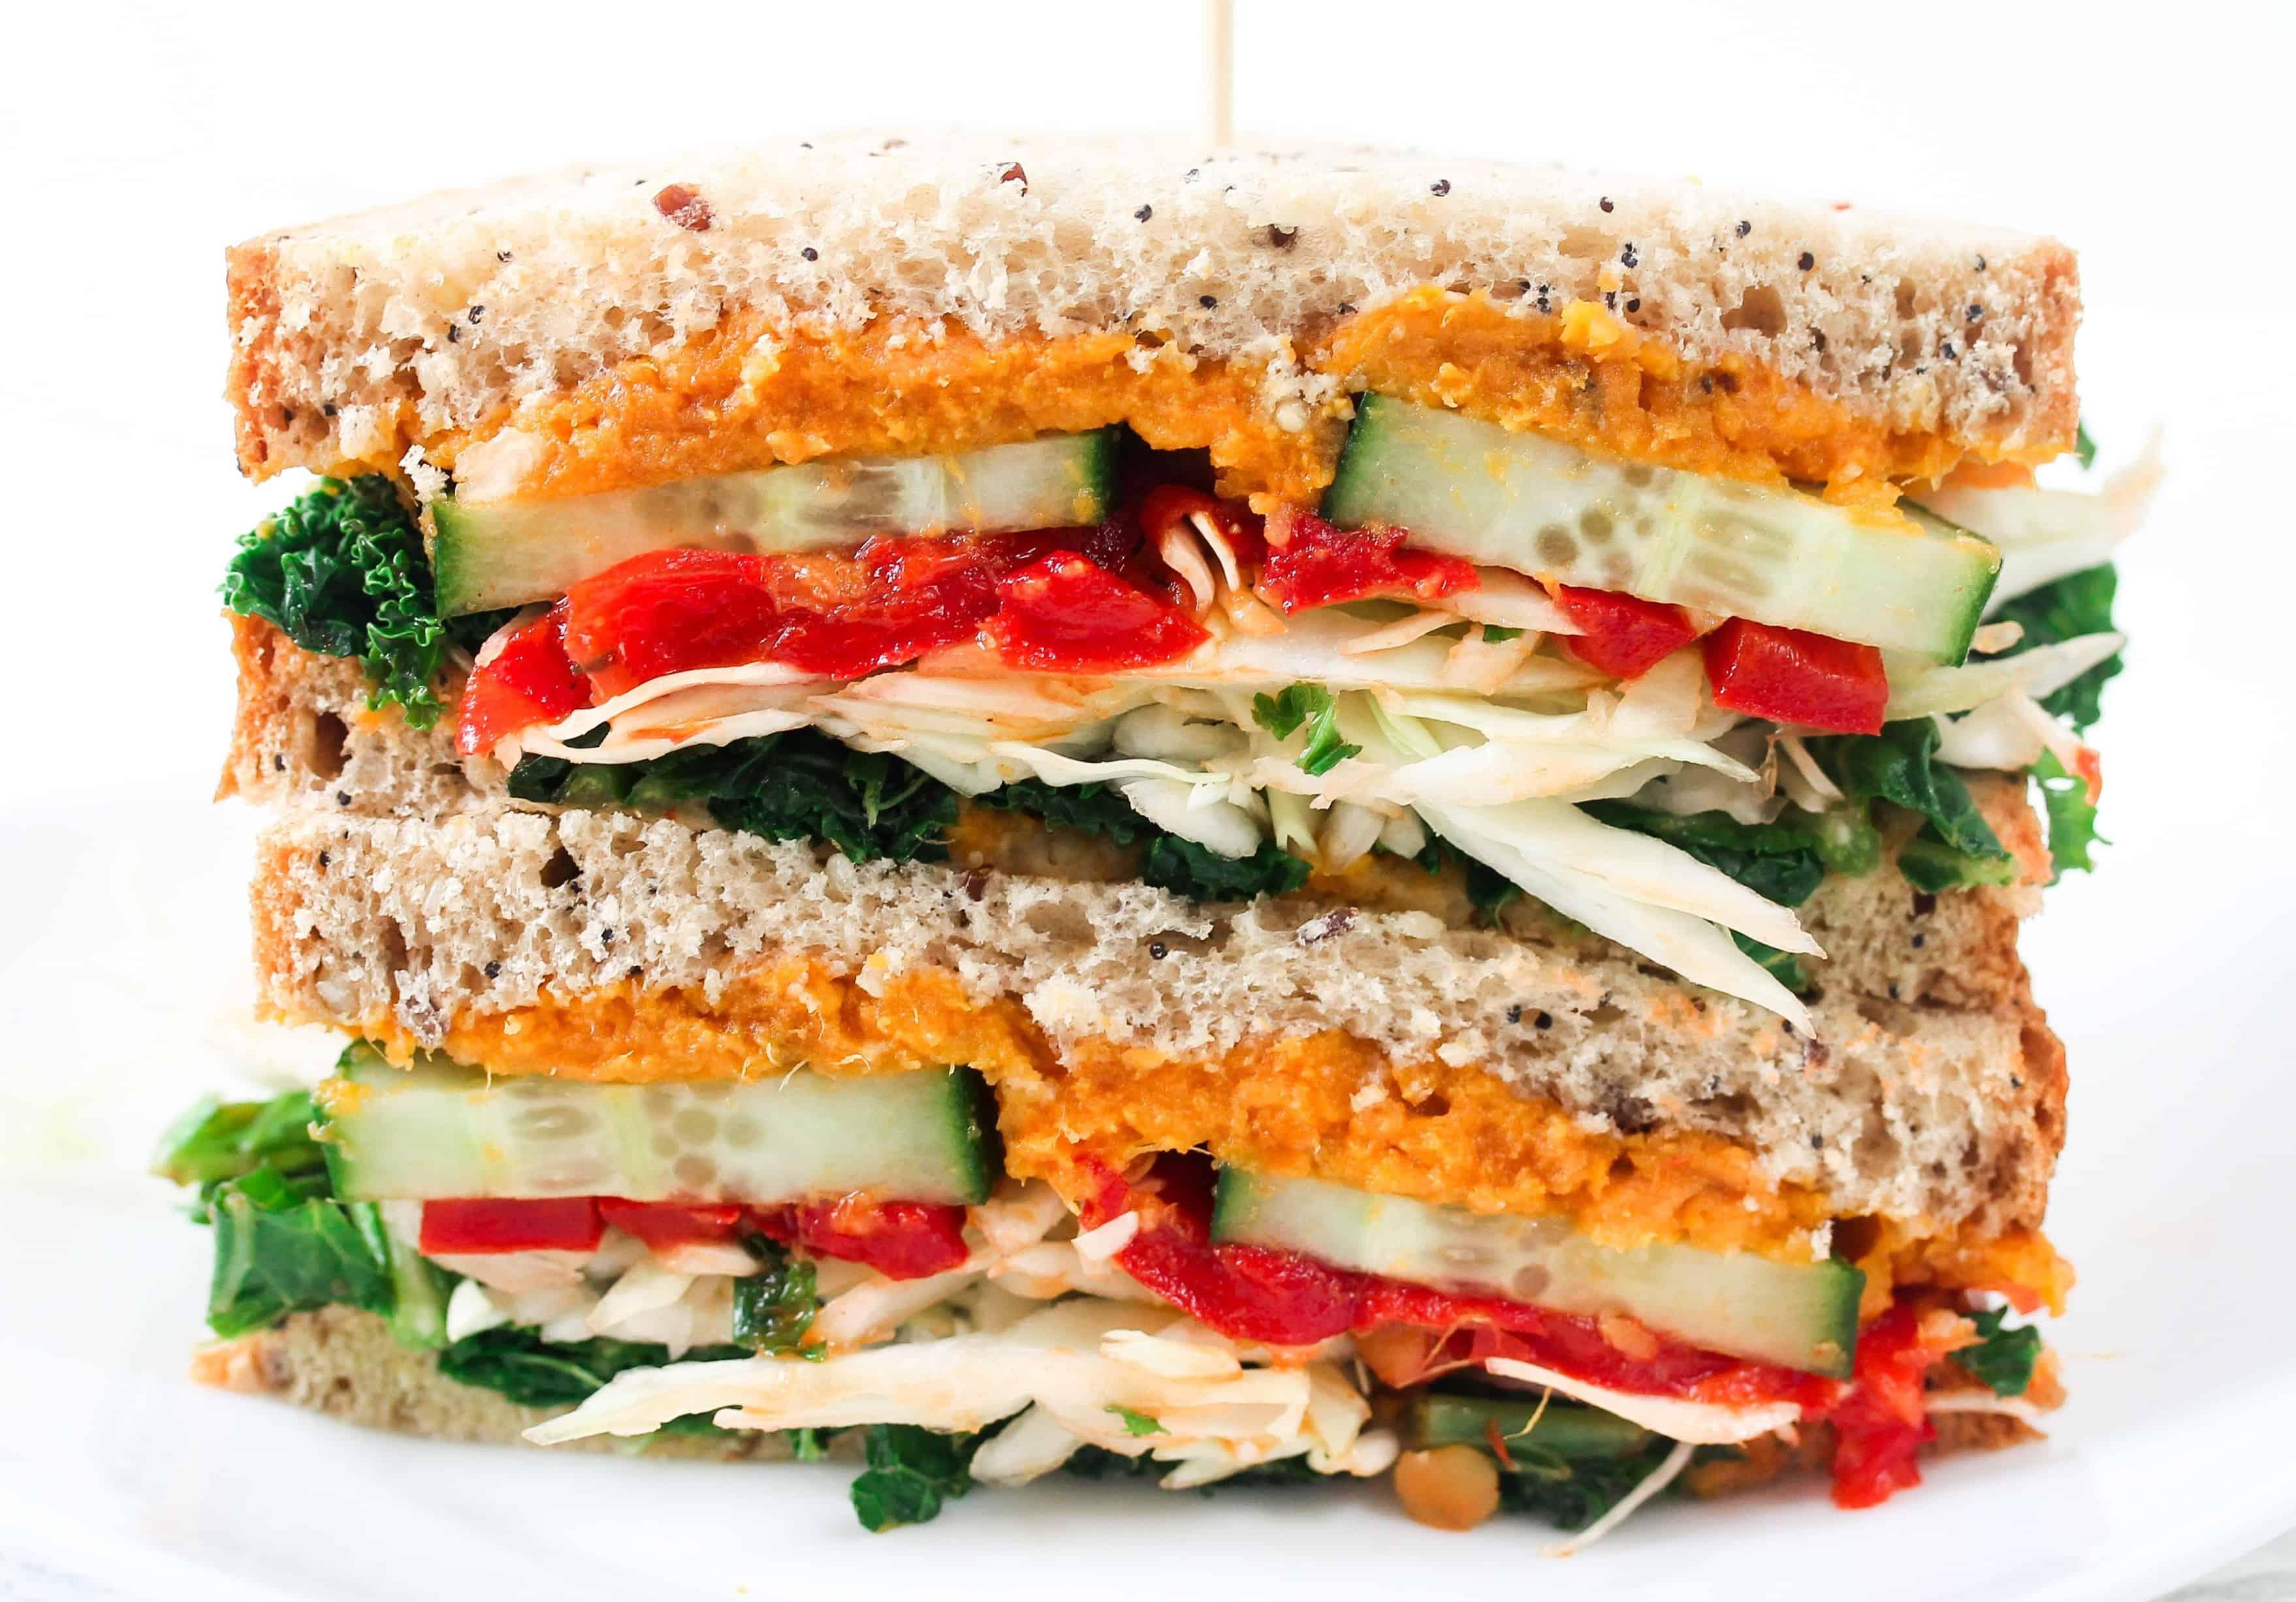 vegan-sweet-potato-and-red-pepper-sandwich